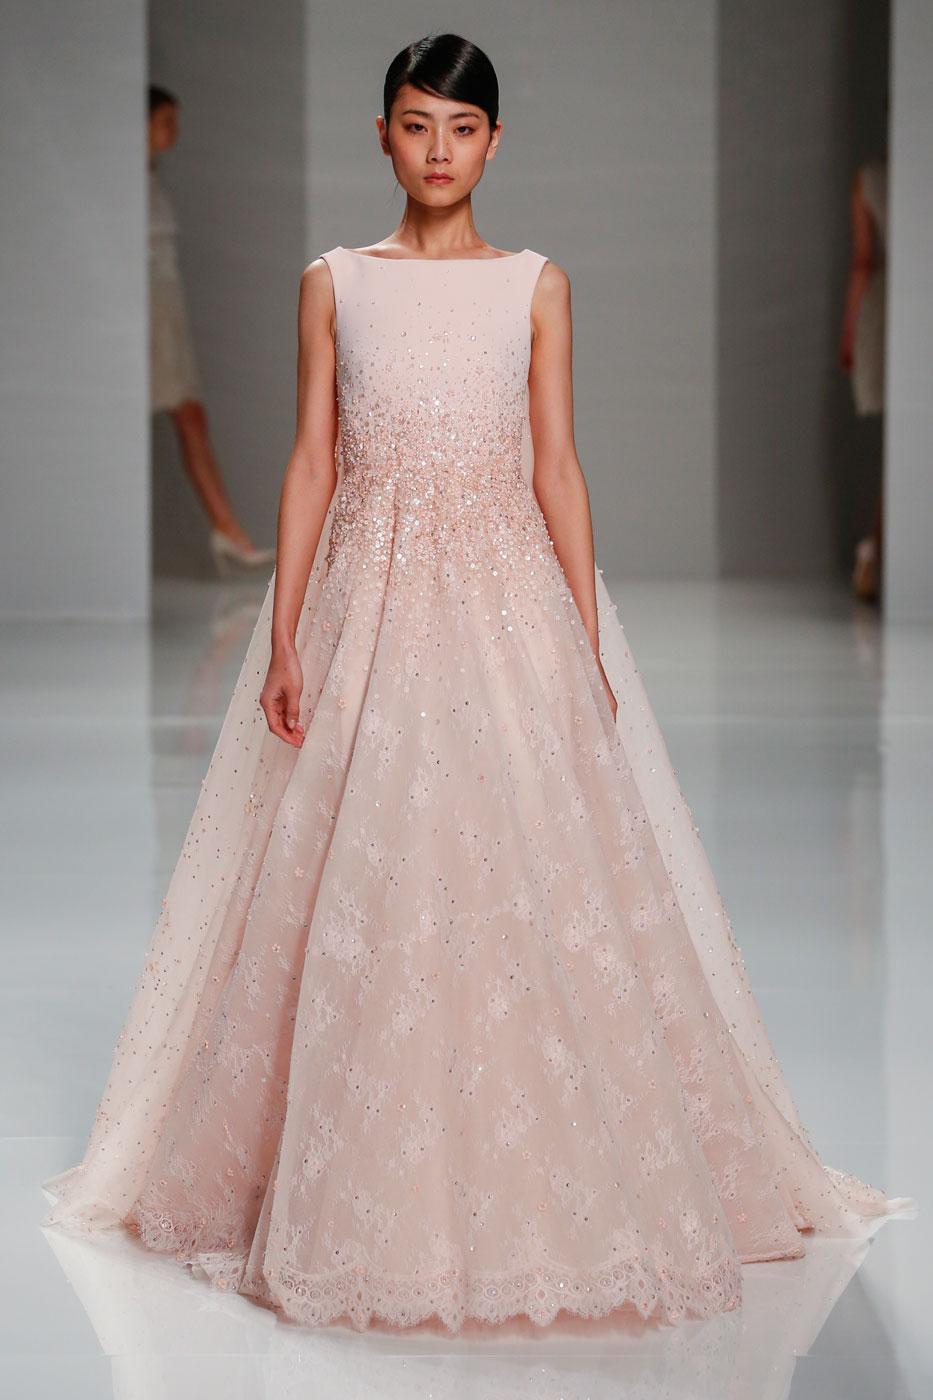 Georges-Hobeika-fashion-runway-show-haute-couture-paris-spring-2015-the-impression-65